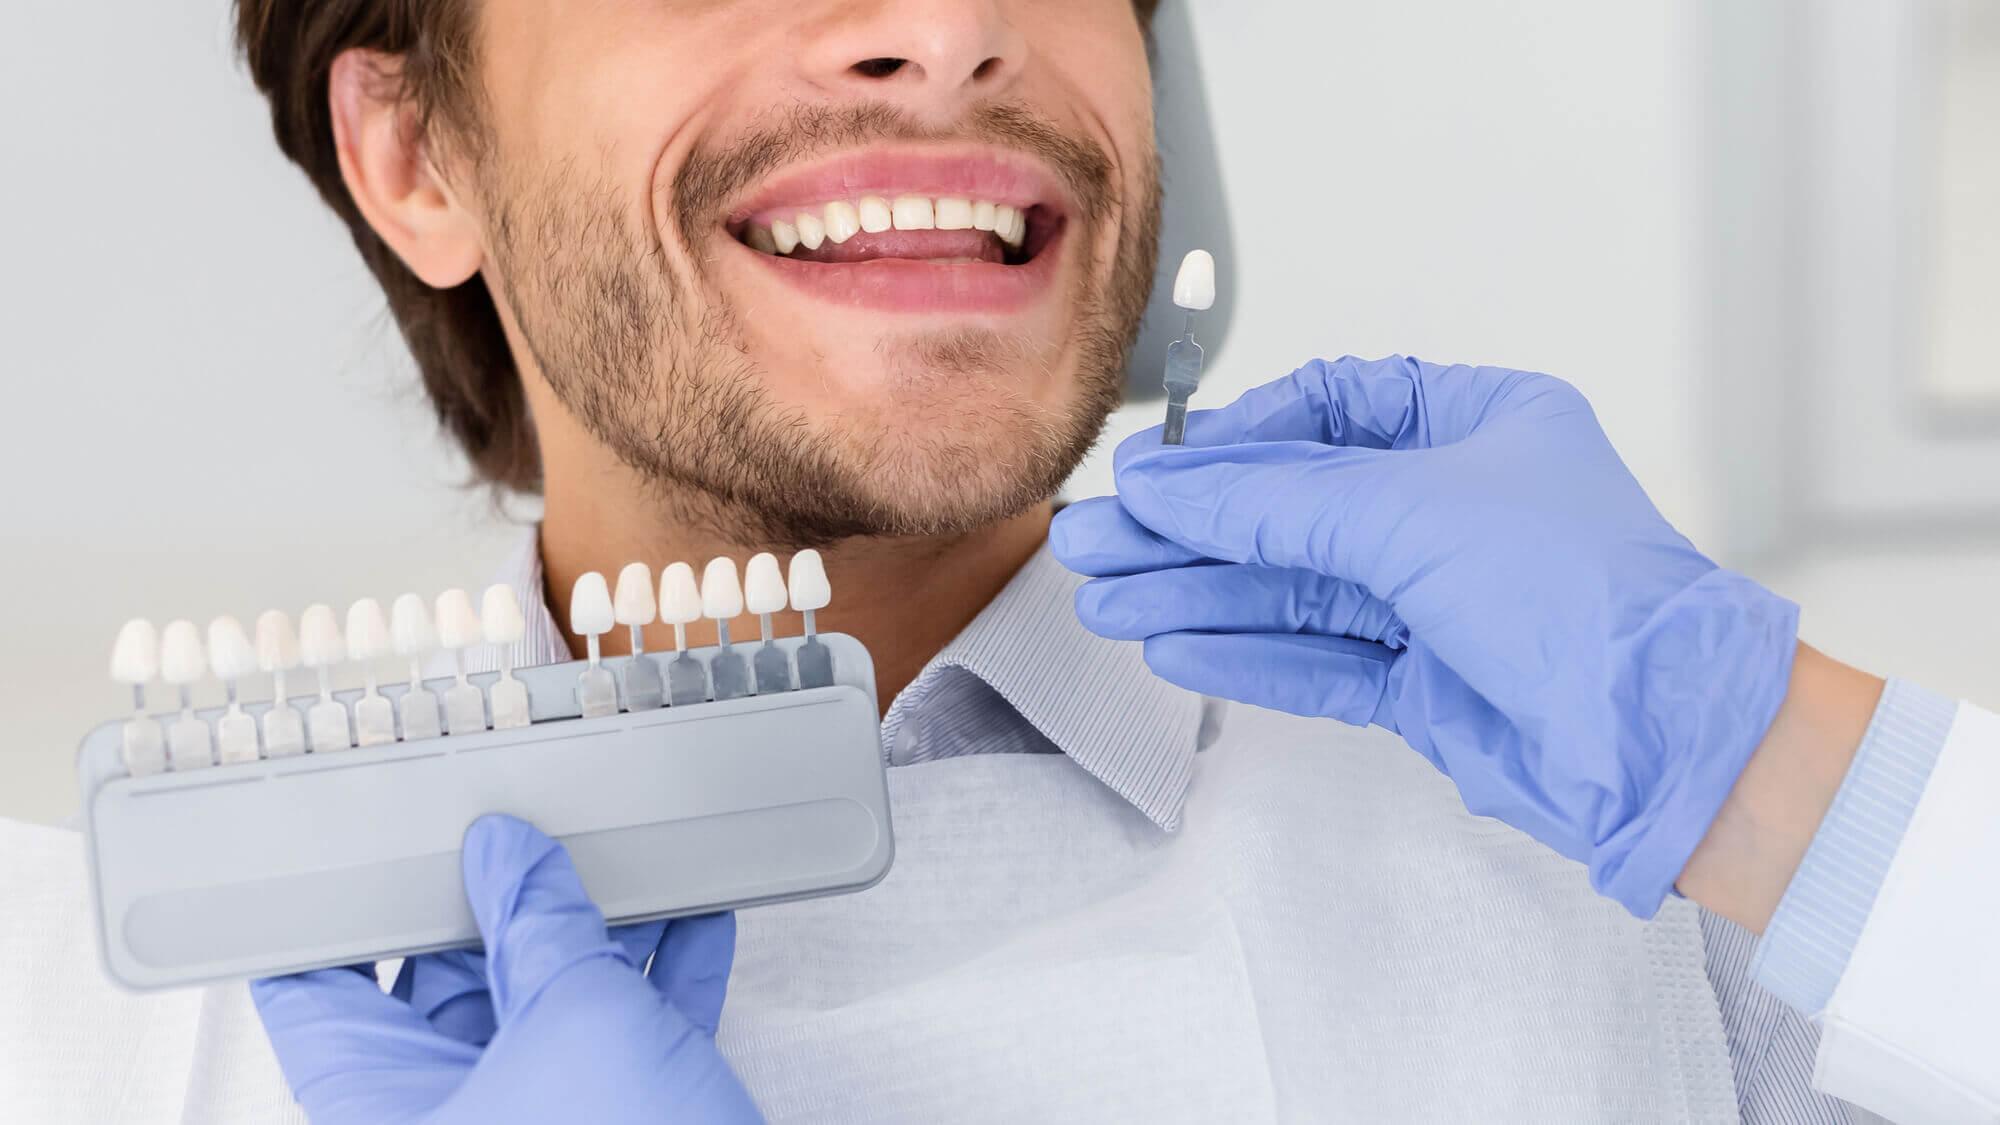 Mle patient Dental Implants in Aventura